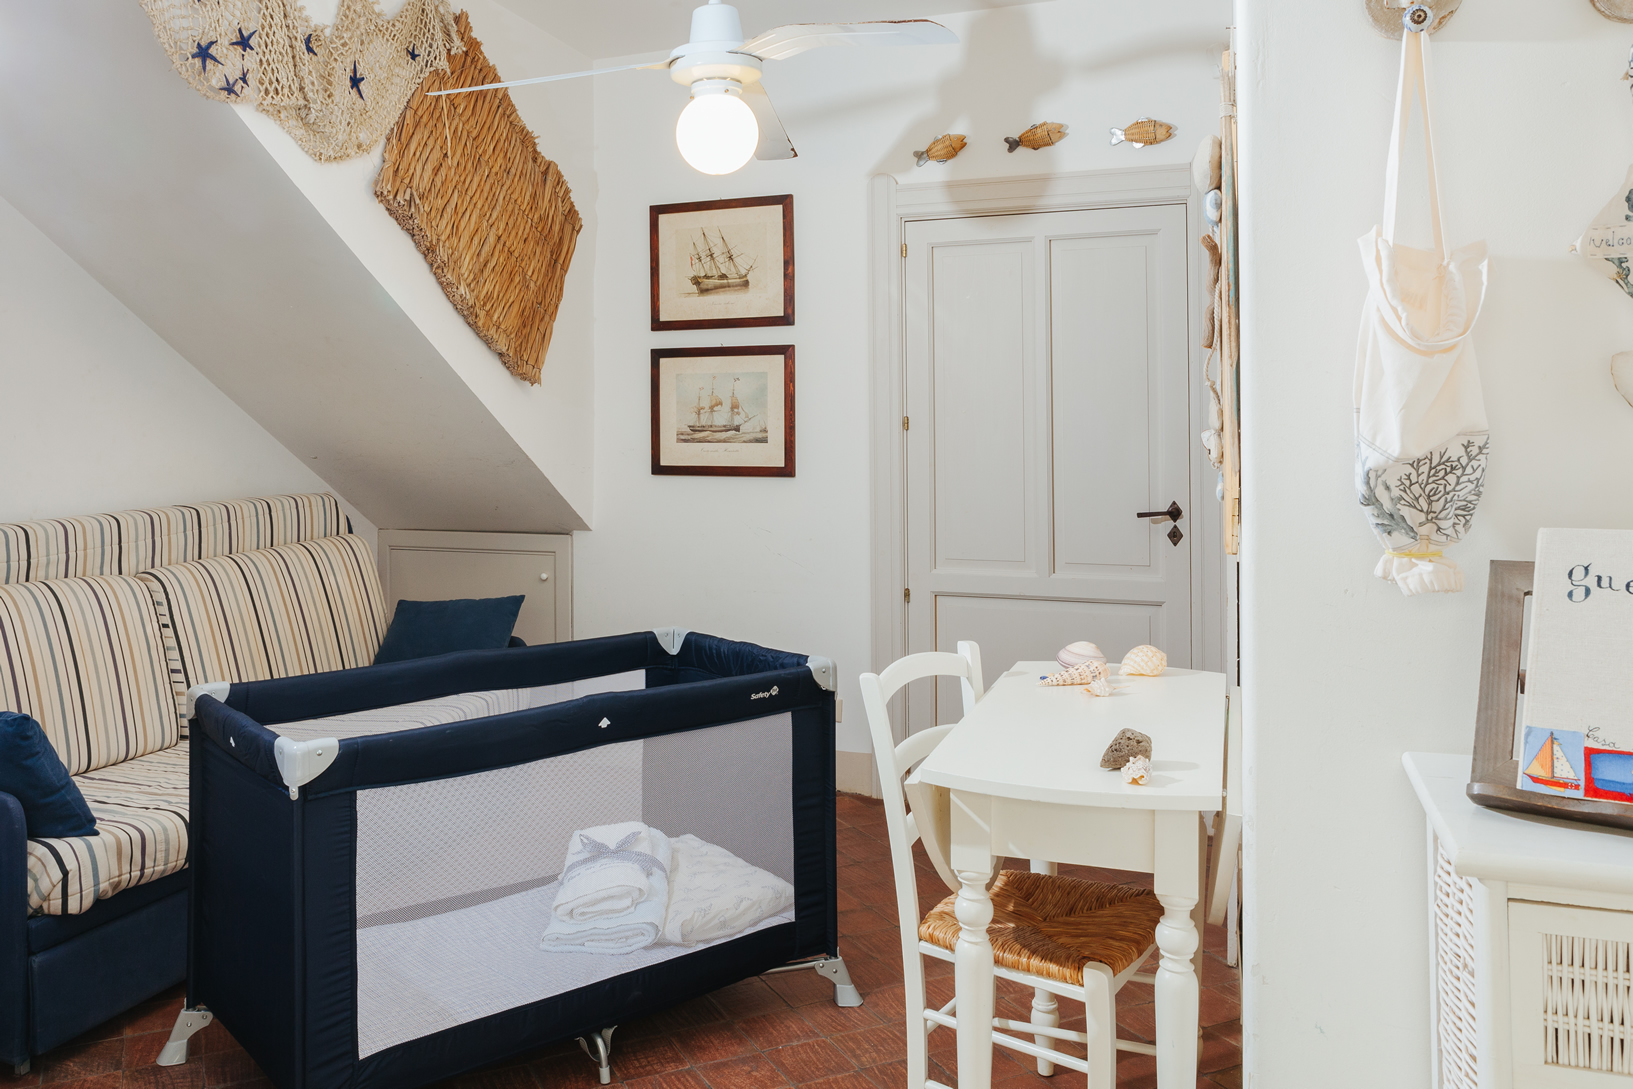 17sampieri-casa-vacanze-sicilia-appartamento-sicily-holiday-apartment-casa-del-pescatore-italia-italy.jpg